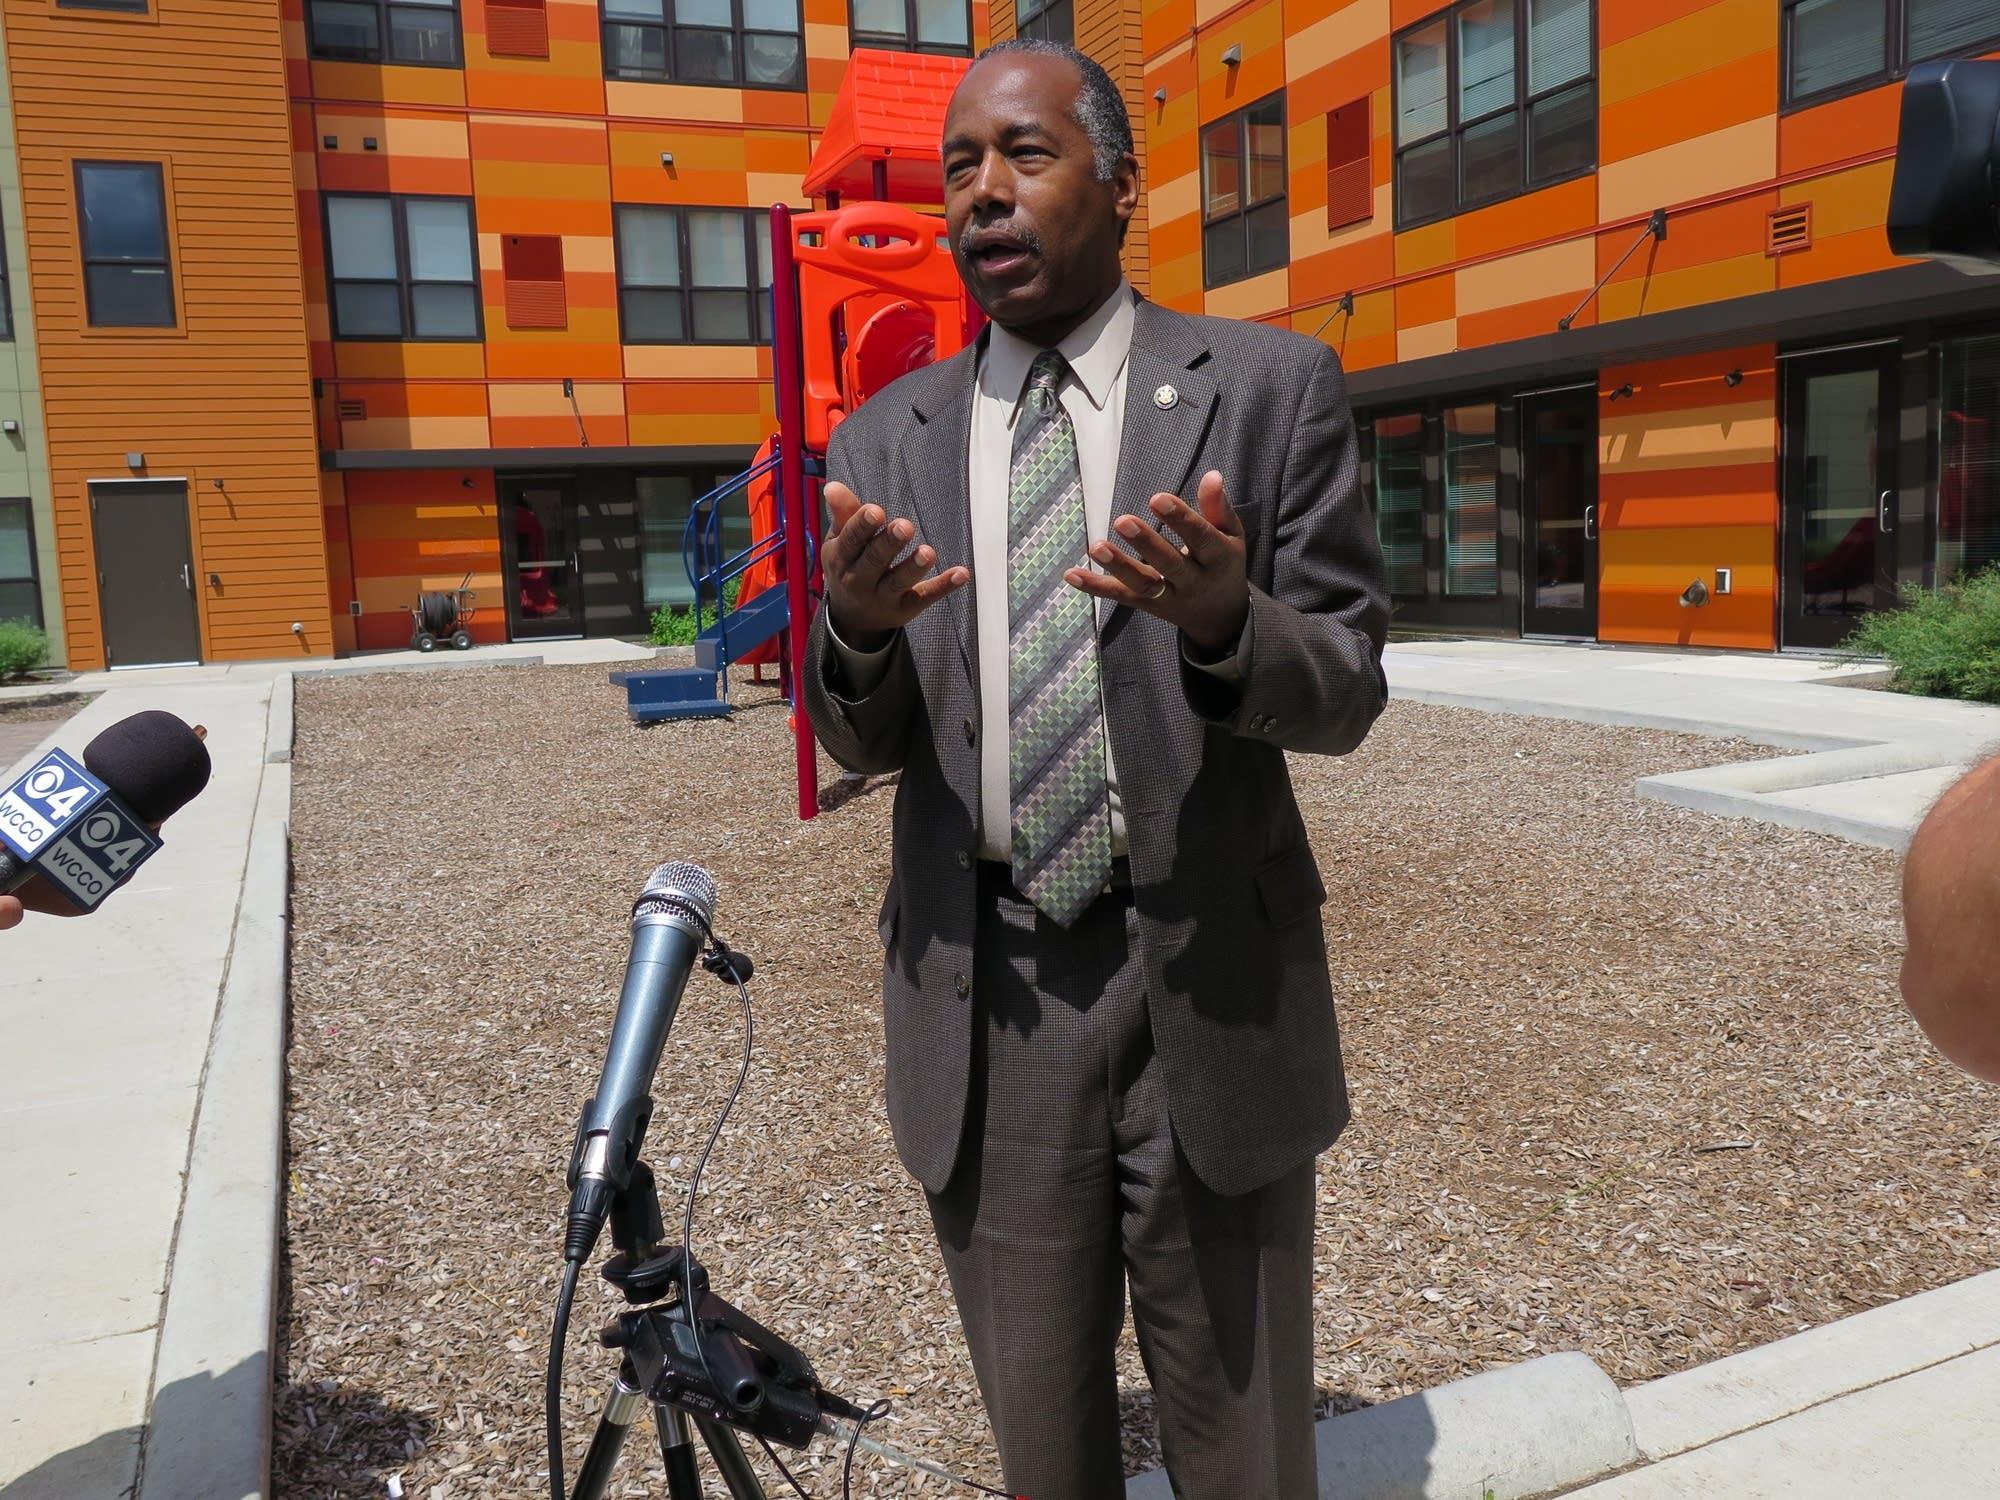 HUD Secretary Carson defends Trump housing policy in Minneapolis